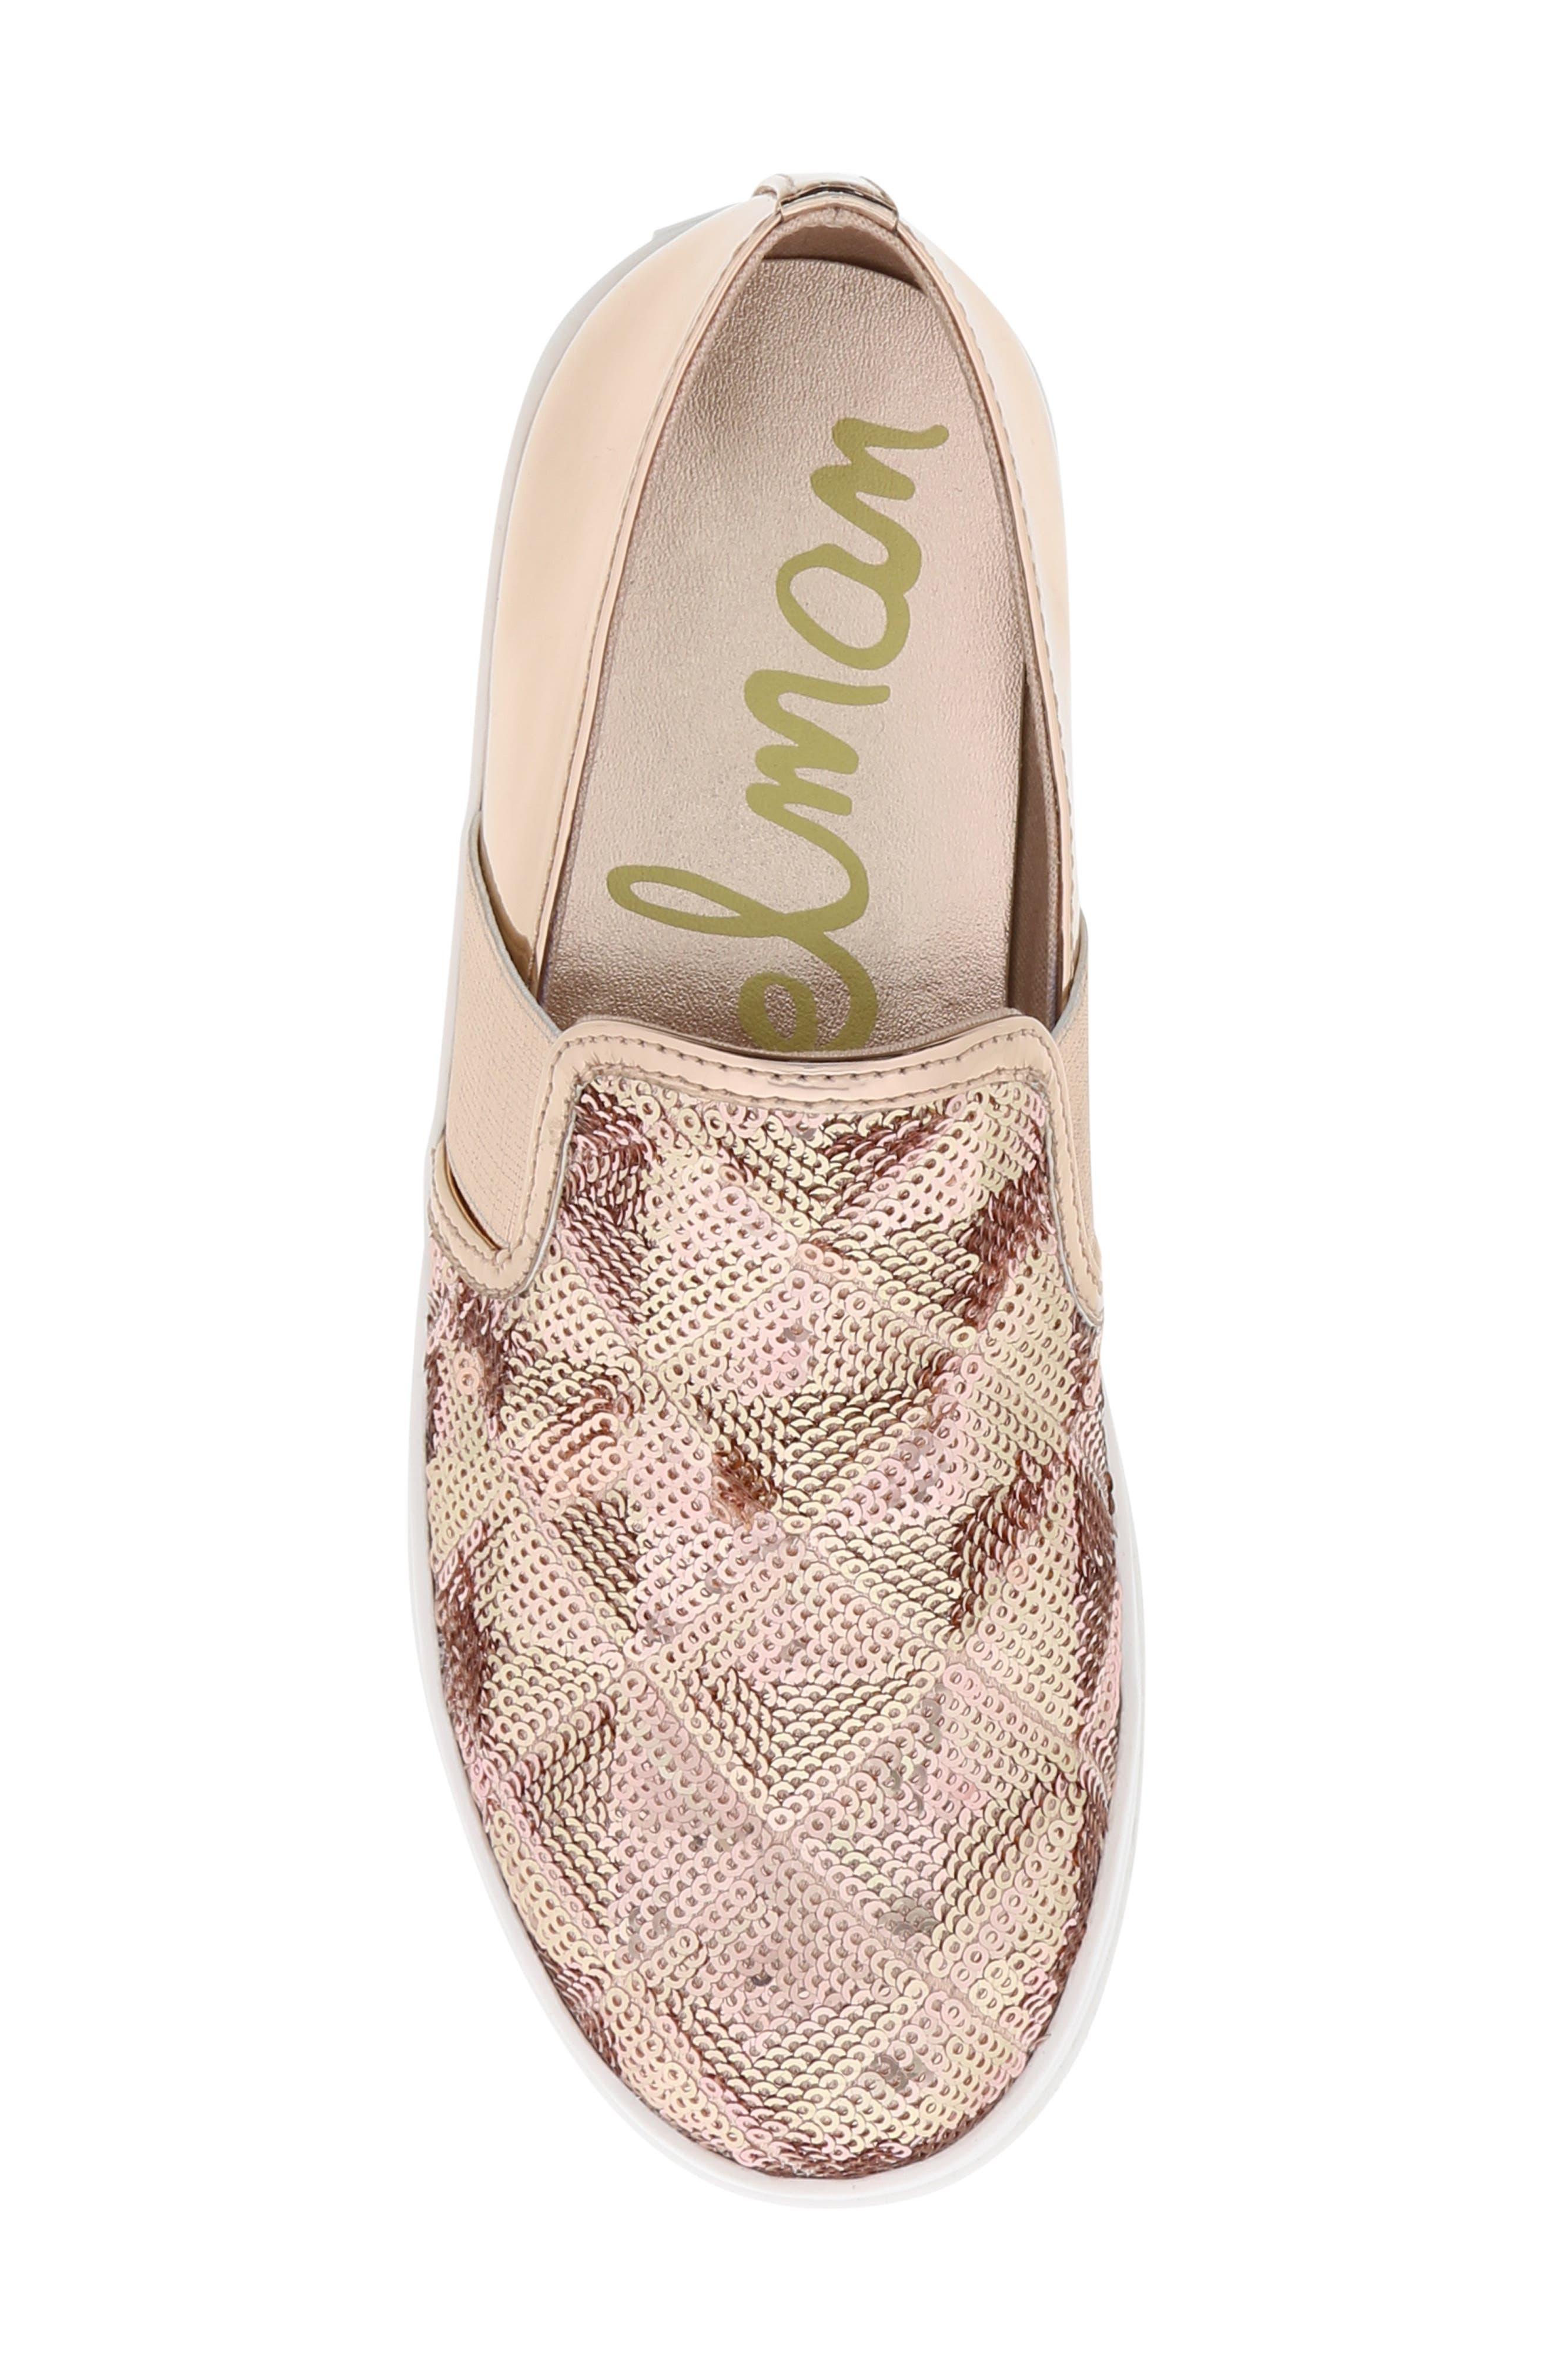 Sheena Pam Sequin Sneaker,                             Alternate thumbnail 5, color,                             ROSE GOLD